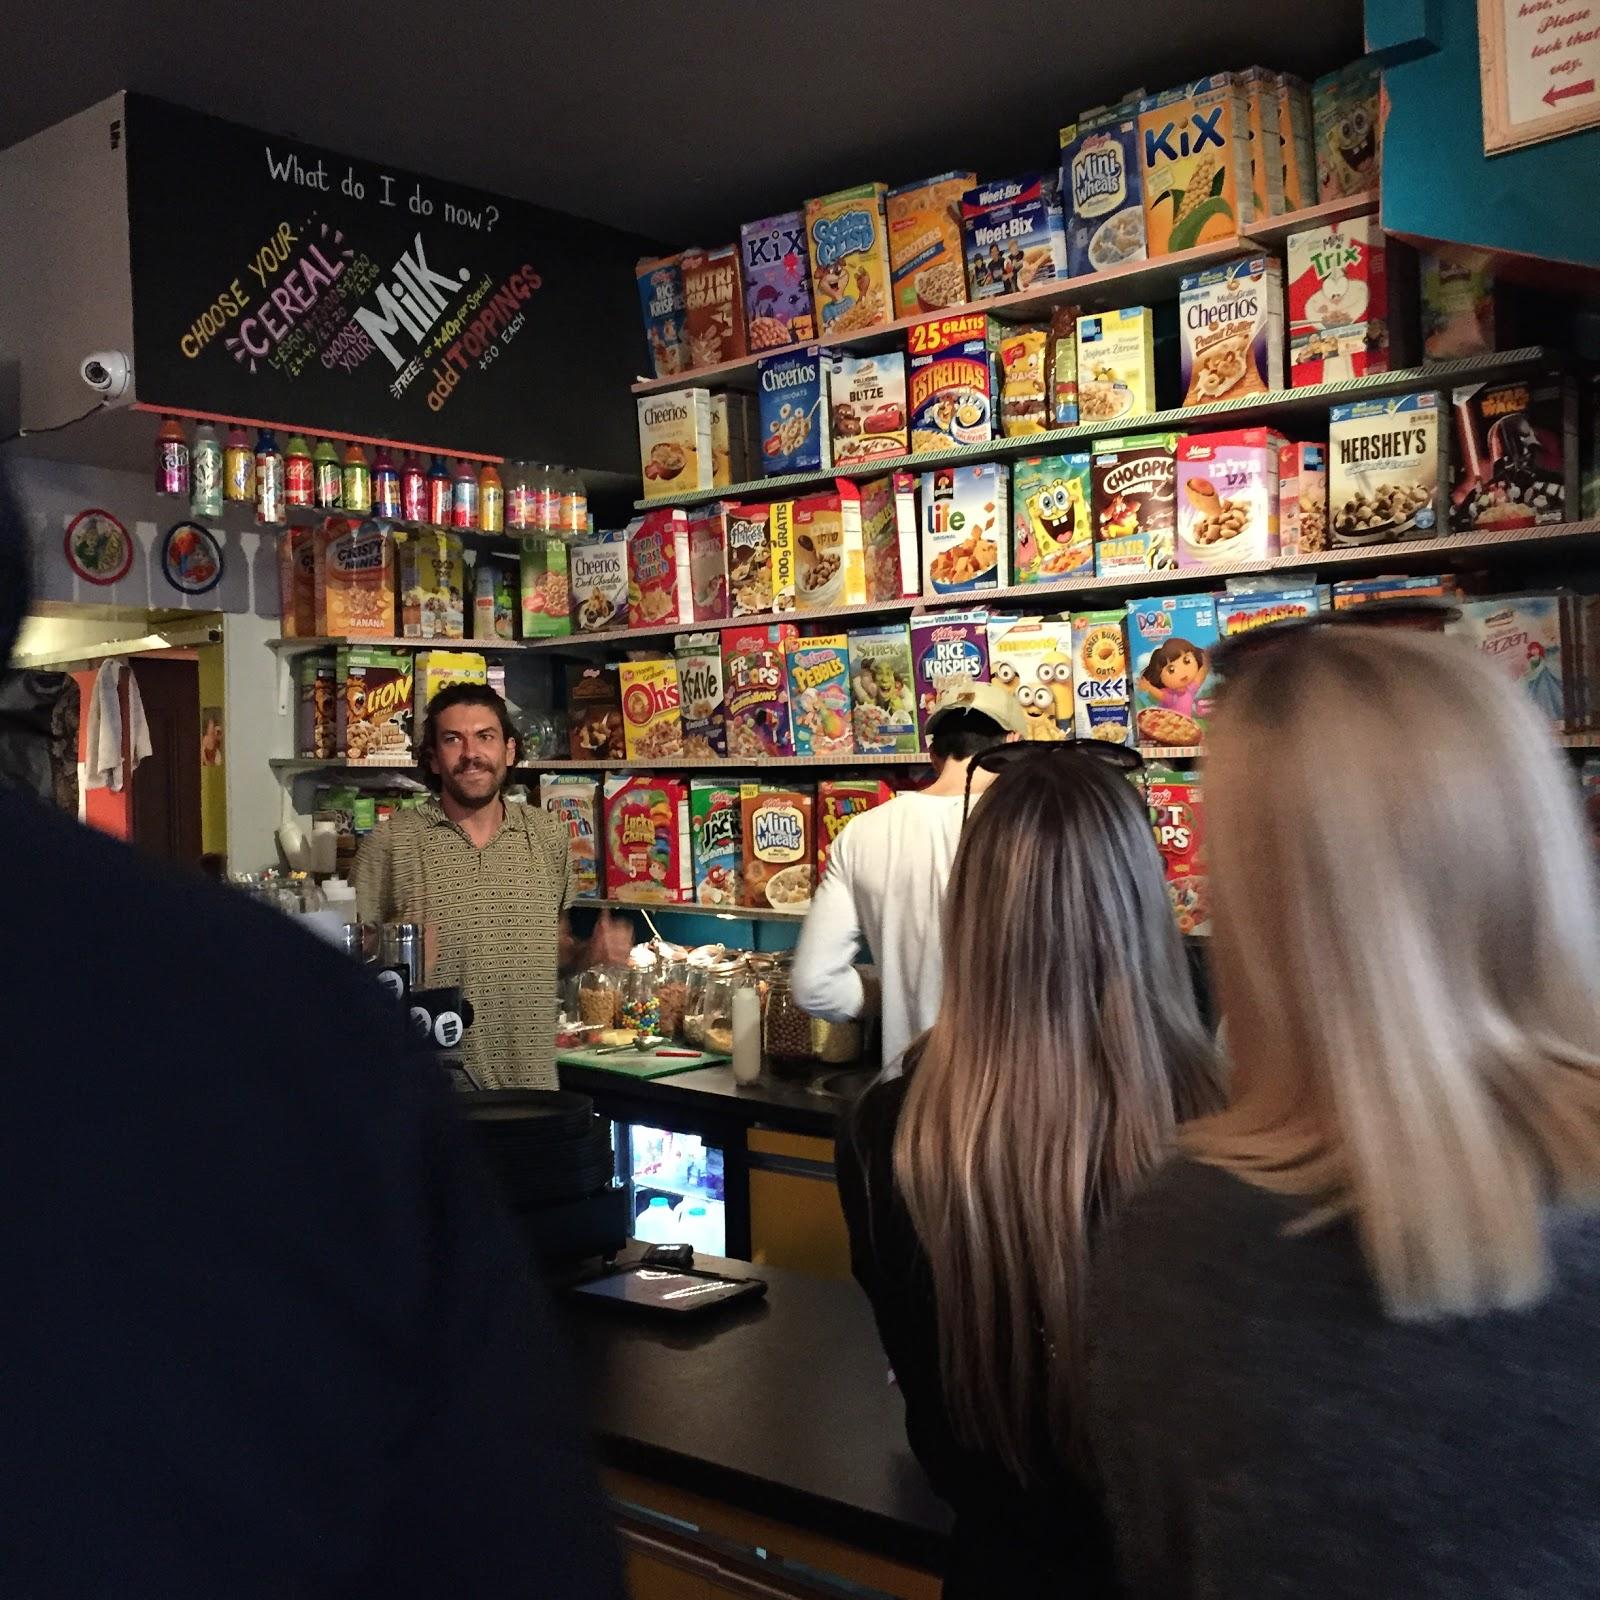 cereal killer cafe in london